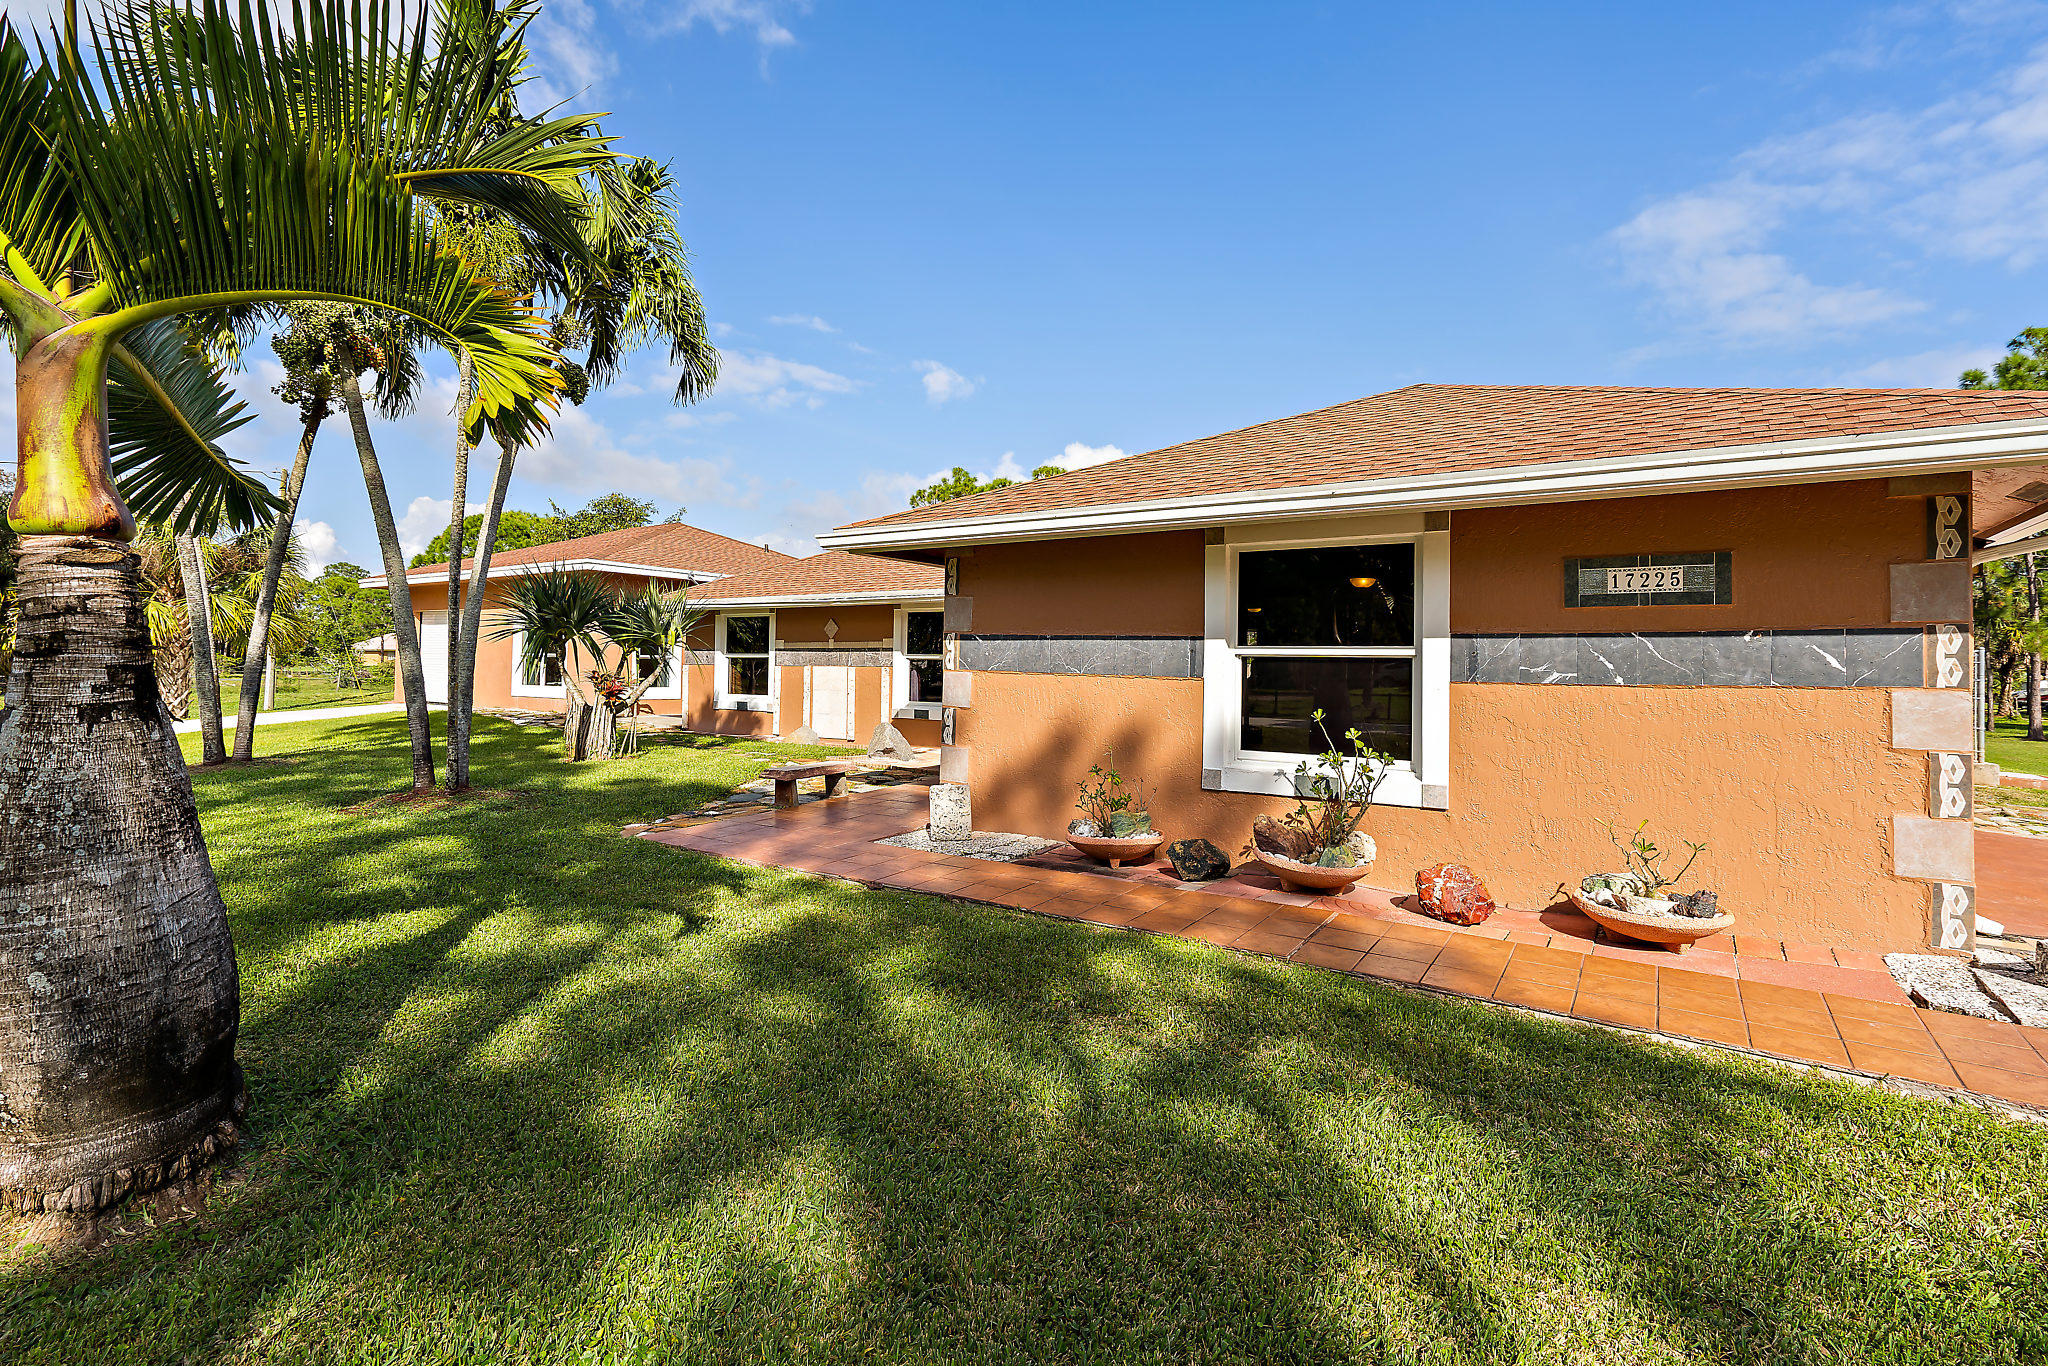 17225 70 Street N, Loxahatchee in Palm Beach County, FL 33470 Home for Sale